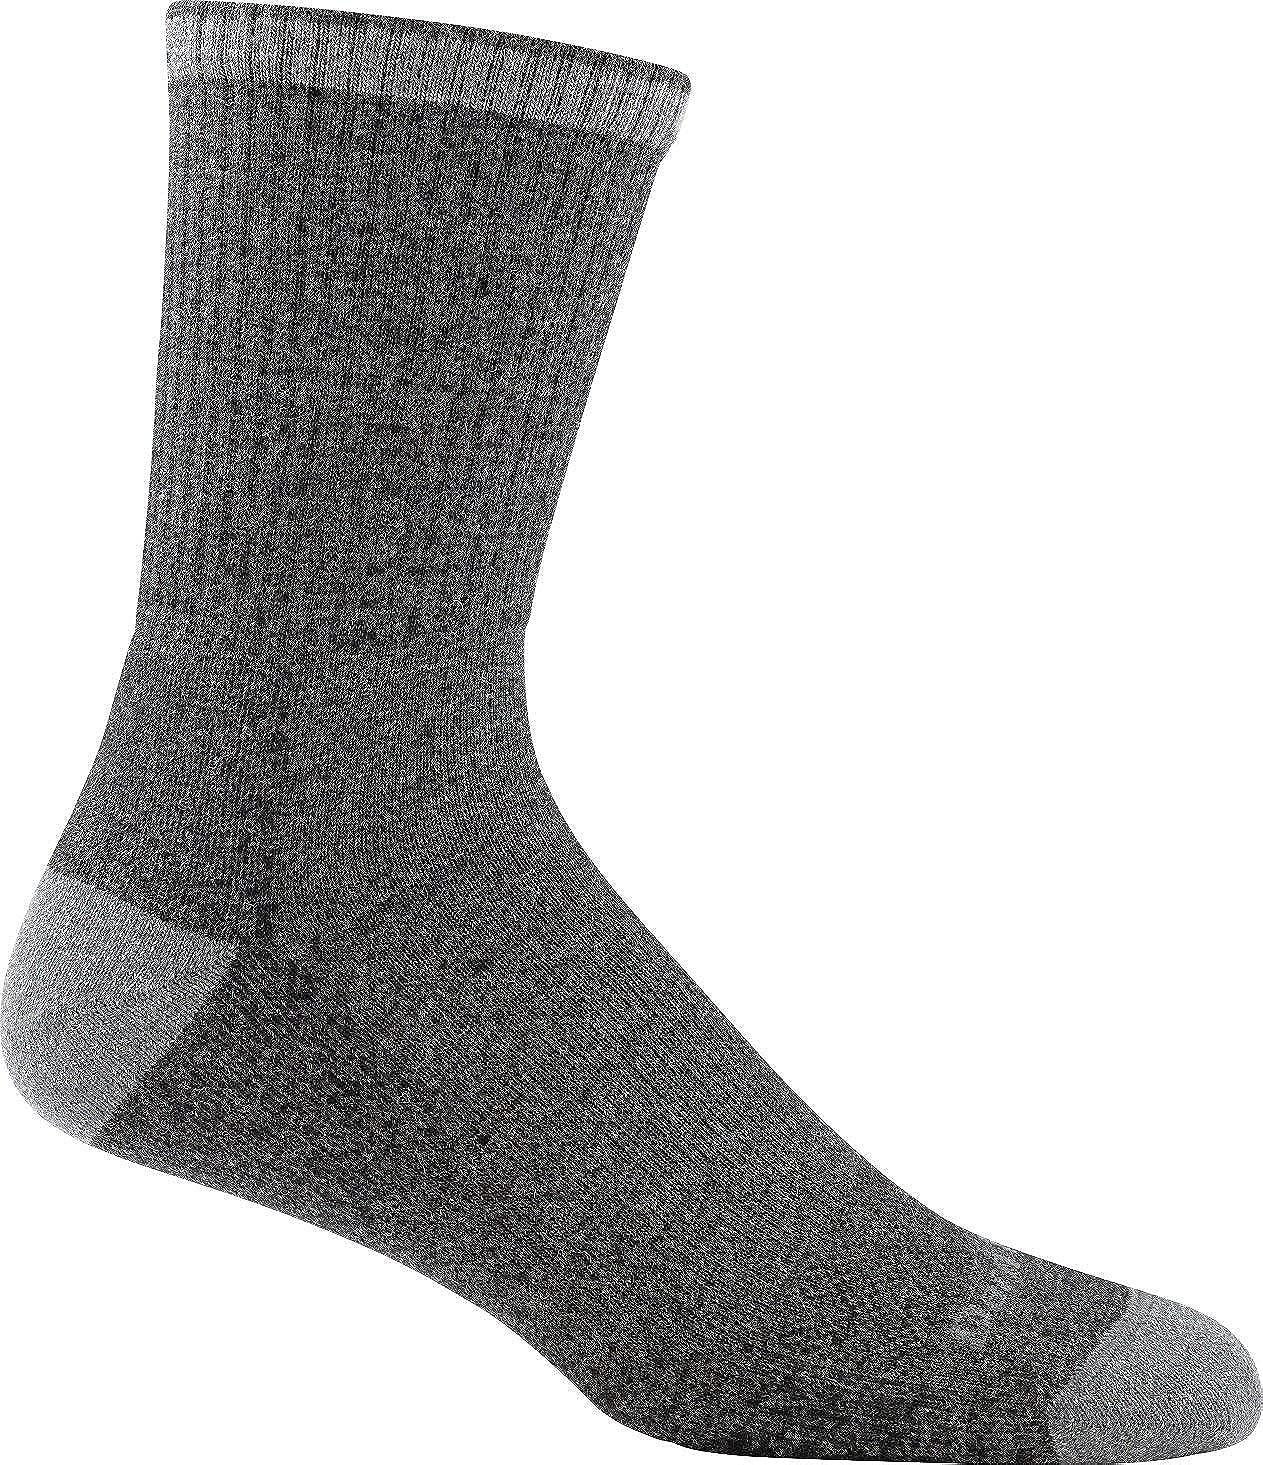 Darn Tough Fred Tuttle Cushion Micro Crew Sock - Men's